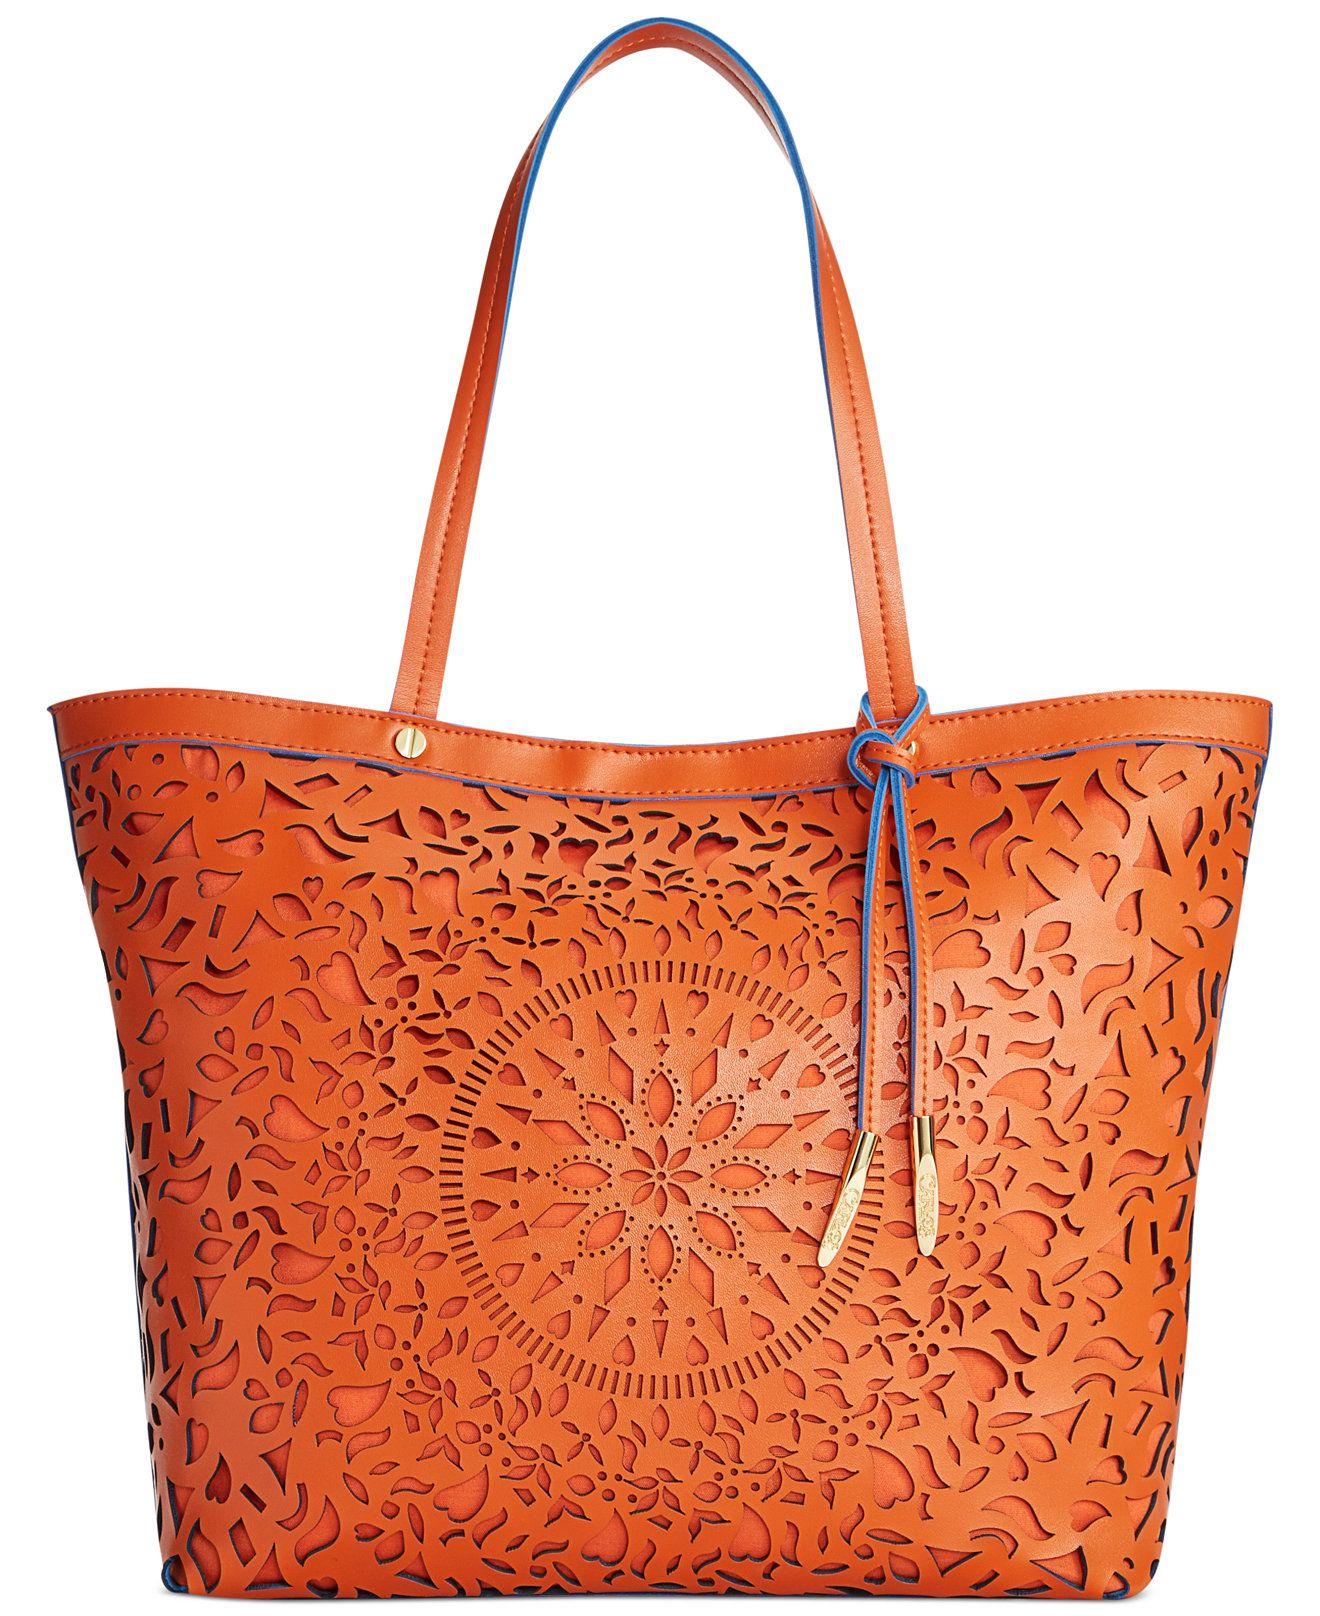 8d4e13a3bd Carlos by Carlos Santana Kailee Tote - Sale & Clearance - Handbags &  Accessories - Macy's $77.99